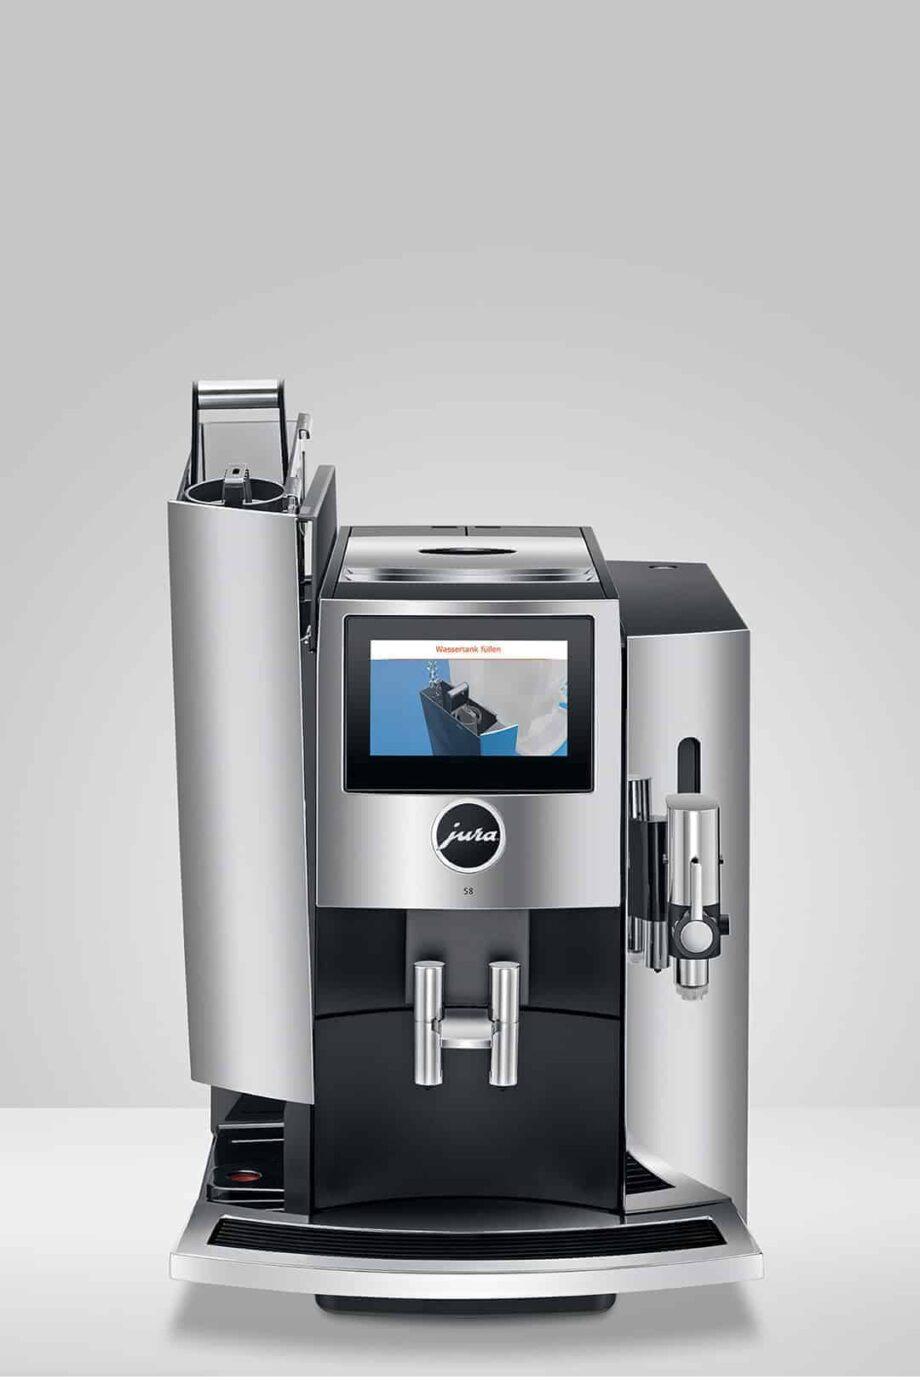 Jura S8 Chrom (2021) - Automatic Espresso machine